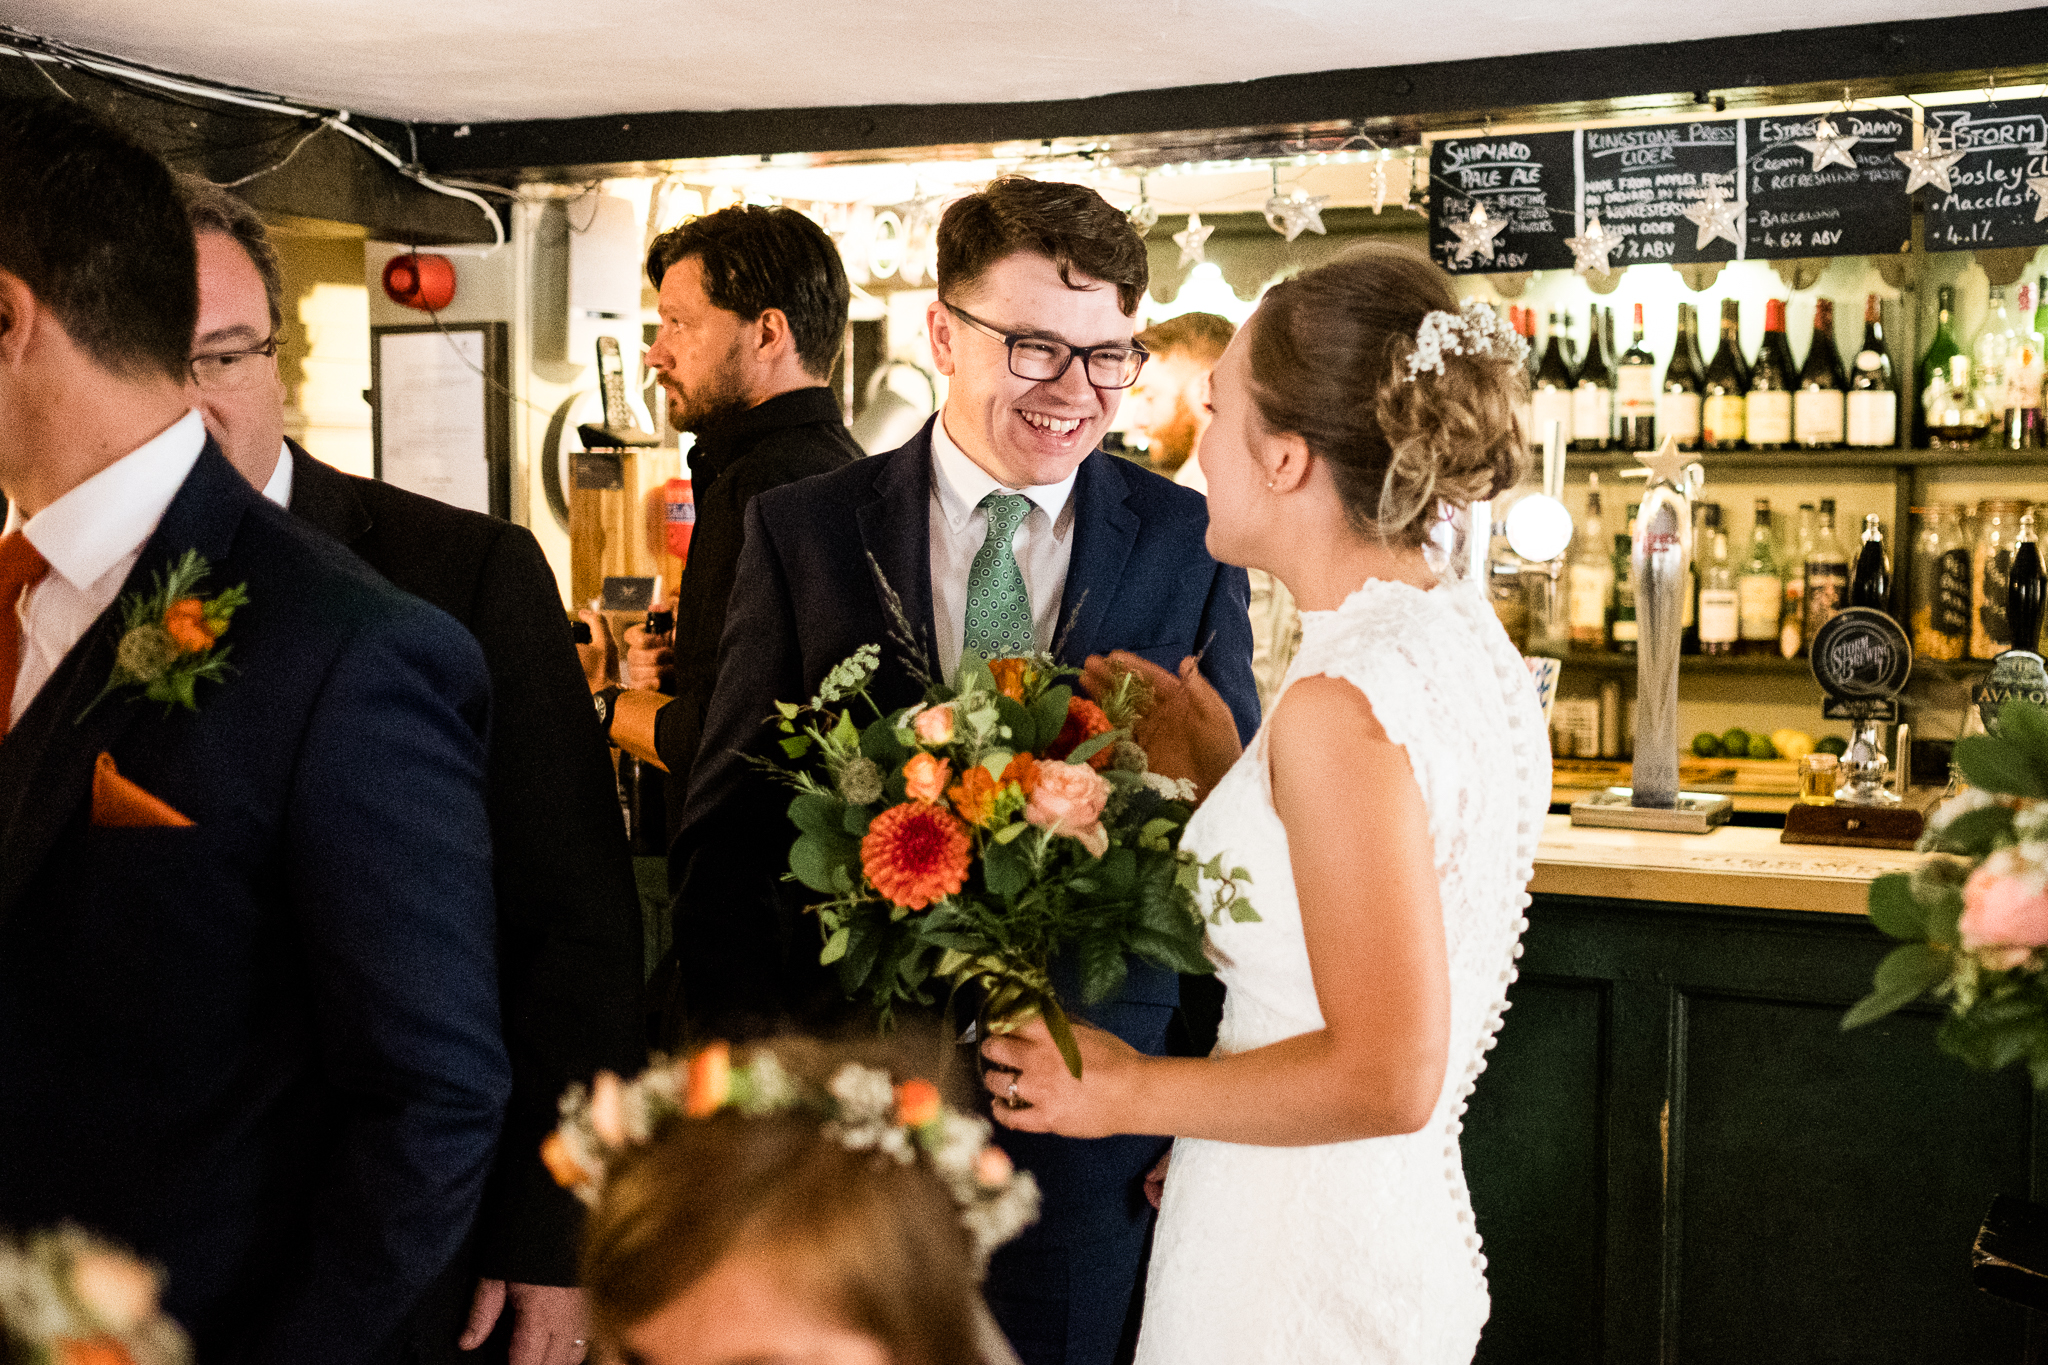 Relaxed Documentary Wedding Photography at The Wizard Inn, Alderley Edge Cheshire - Jenny Harper-36.jpg